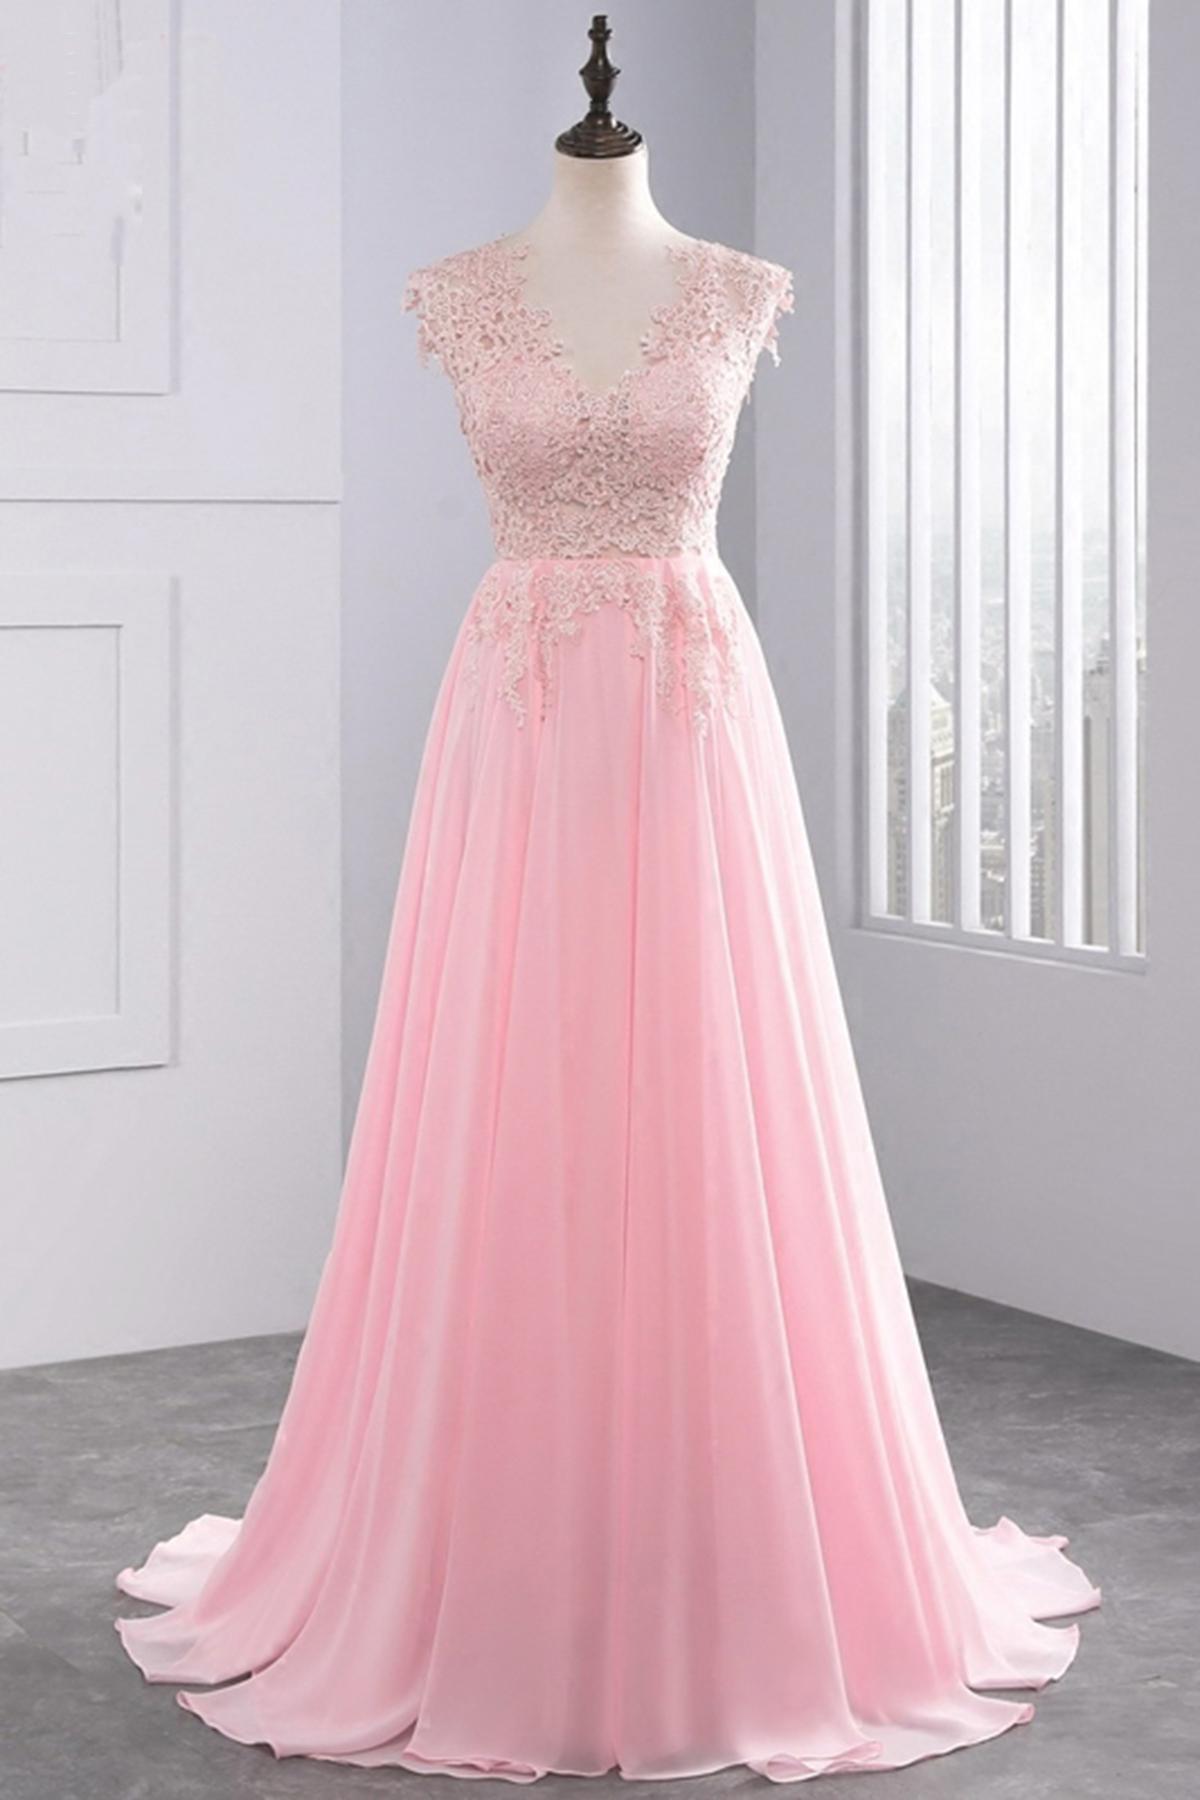 667e34648eb6 Cheap Prom Dresses by SweetheartDress · Unique pink chiffon long cap ...